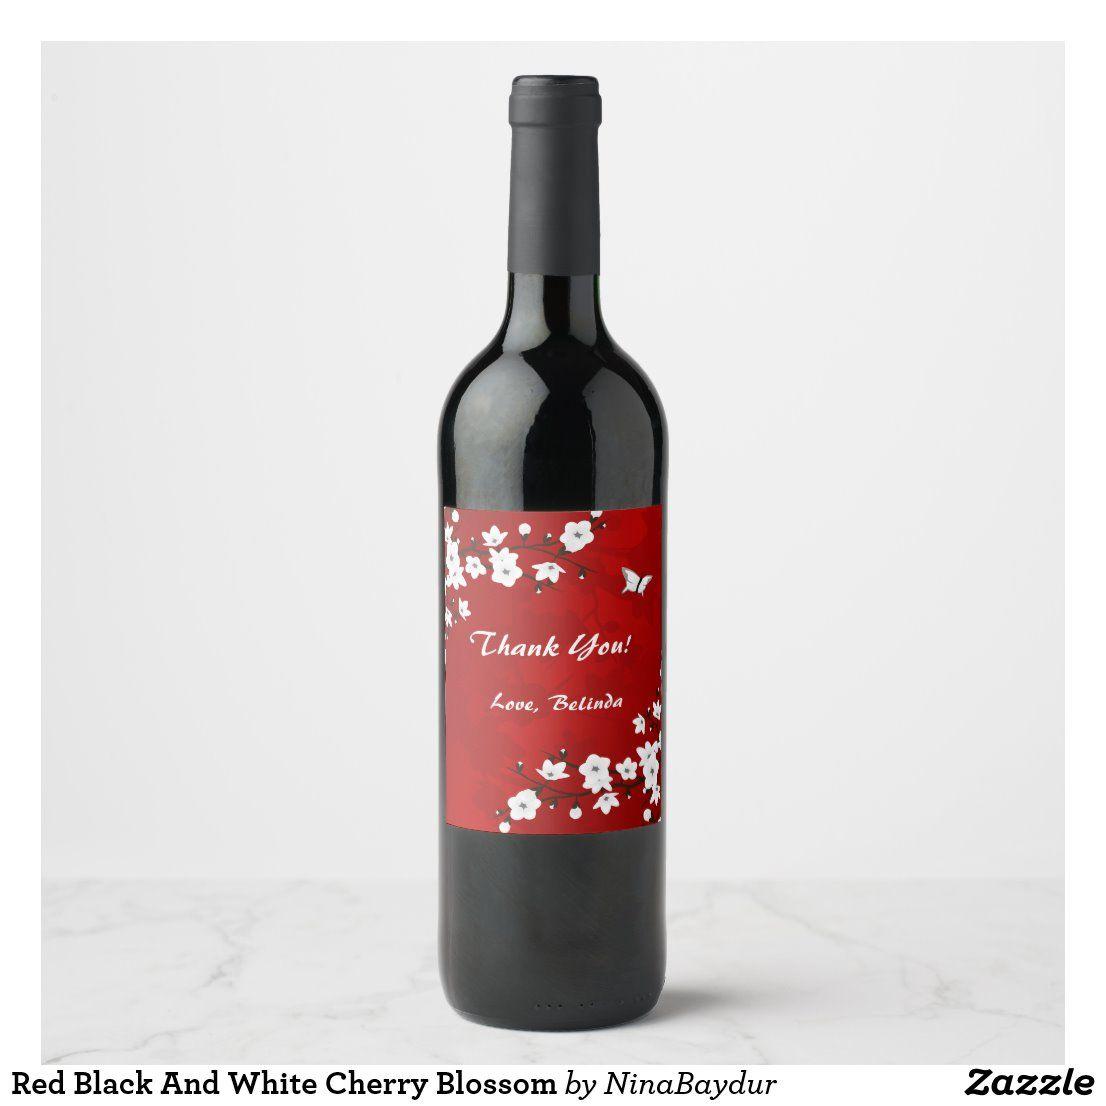 Red Black And White Cherry Blossom Wine Label Zazzle Com In 2020 White Cherry Blossom White Cherries Cherry Blossom